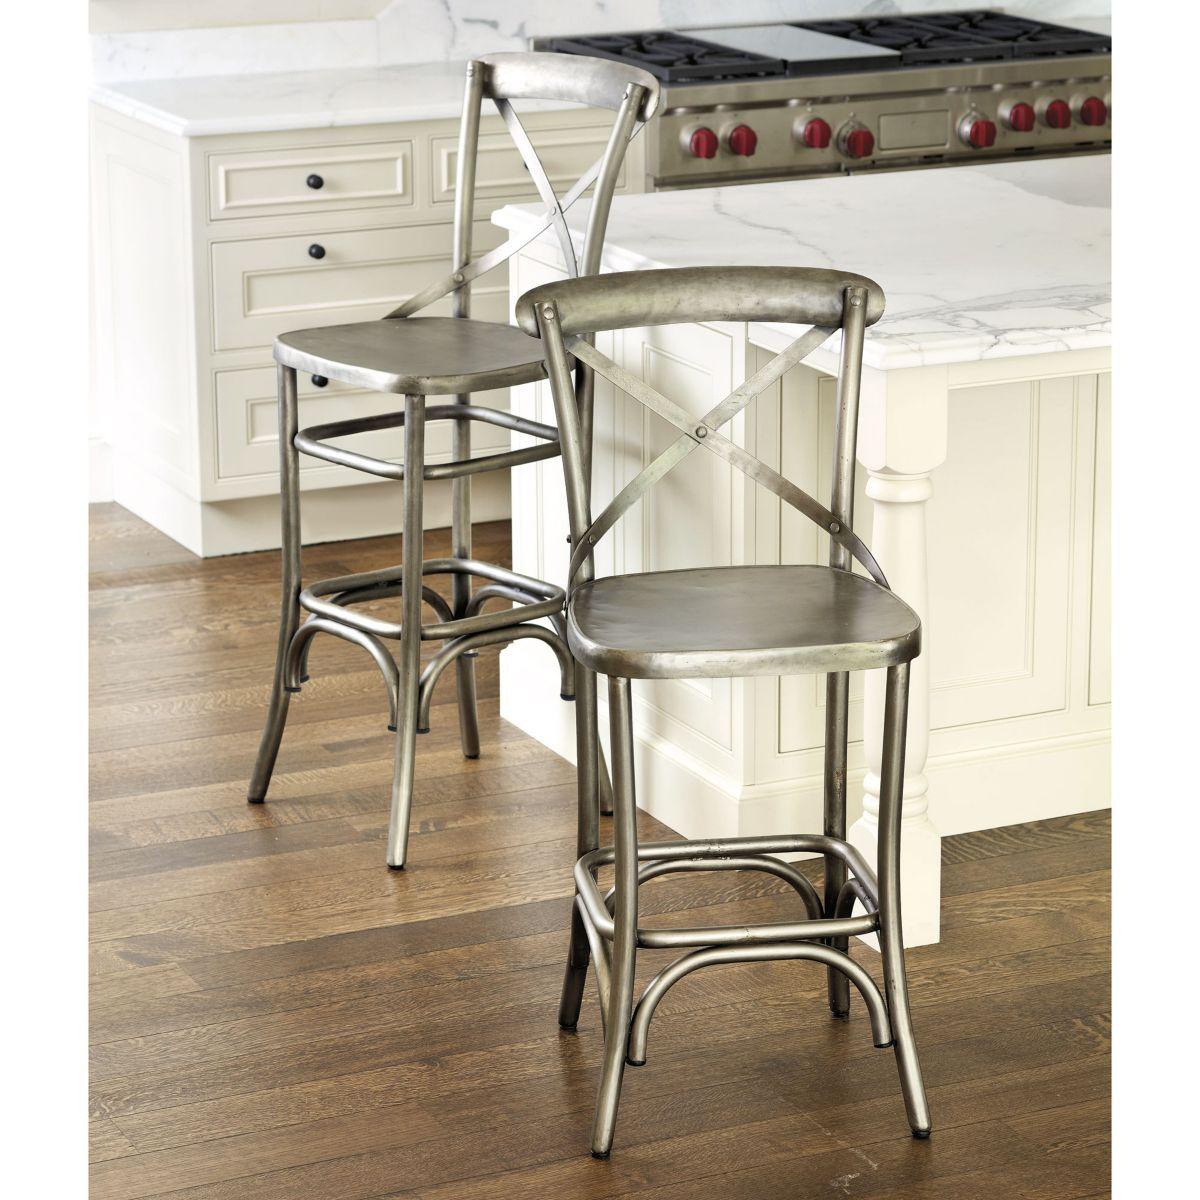 ballard designs constance metal counter stool | kitchen/dining